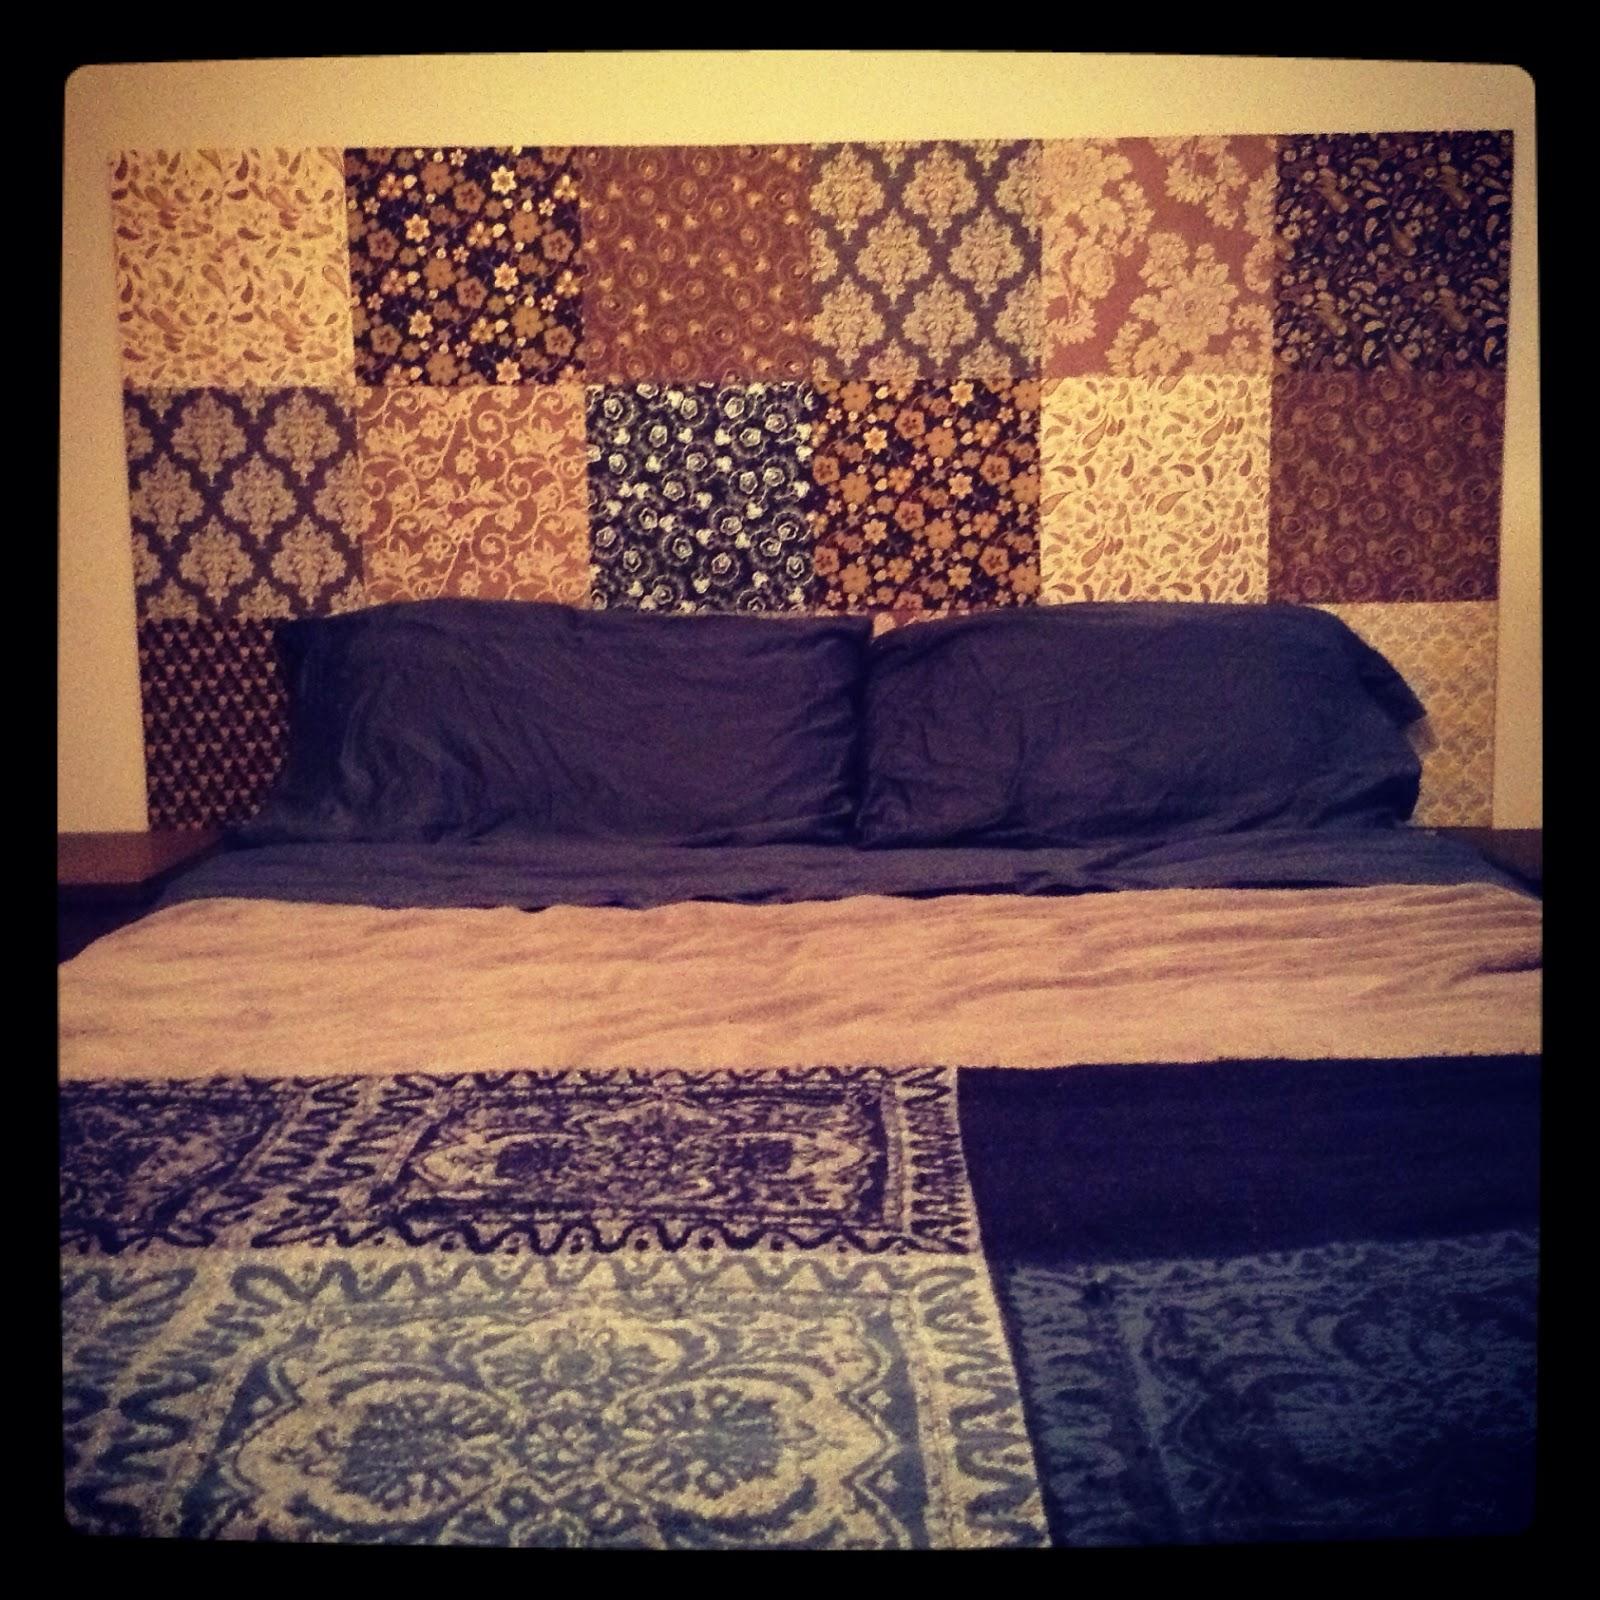 m4rilynj0y diy wall mounted headboard completed. Black Bedroom Furniture Sets. Home Design Ideas